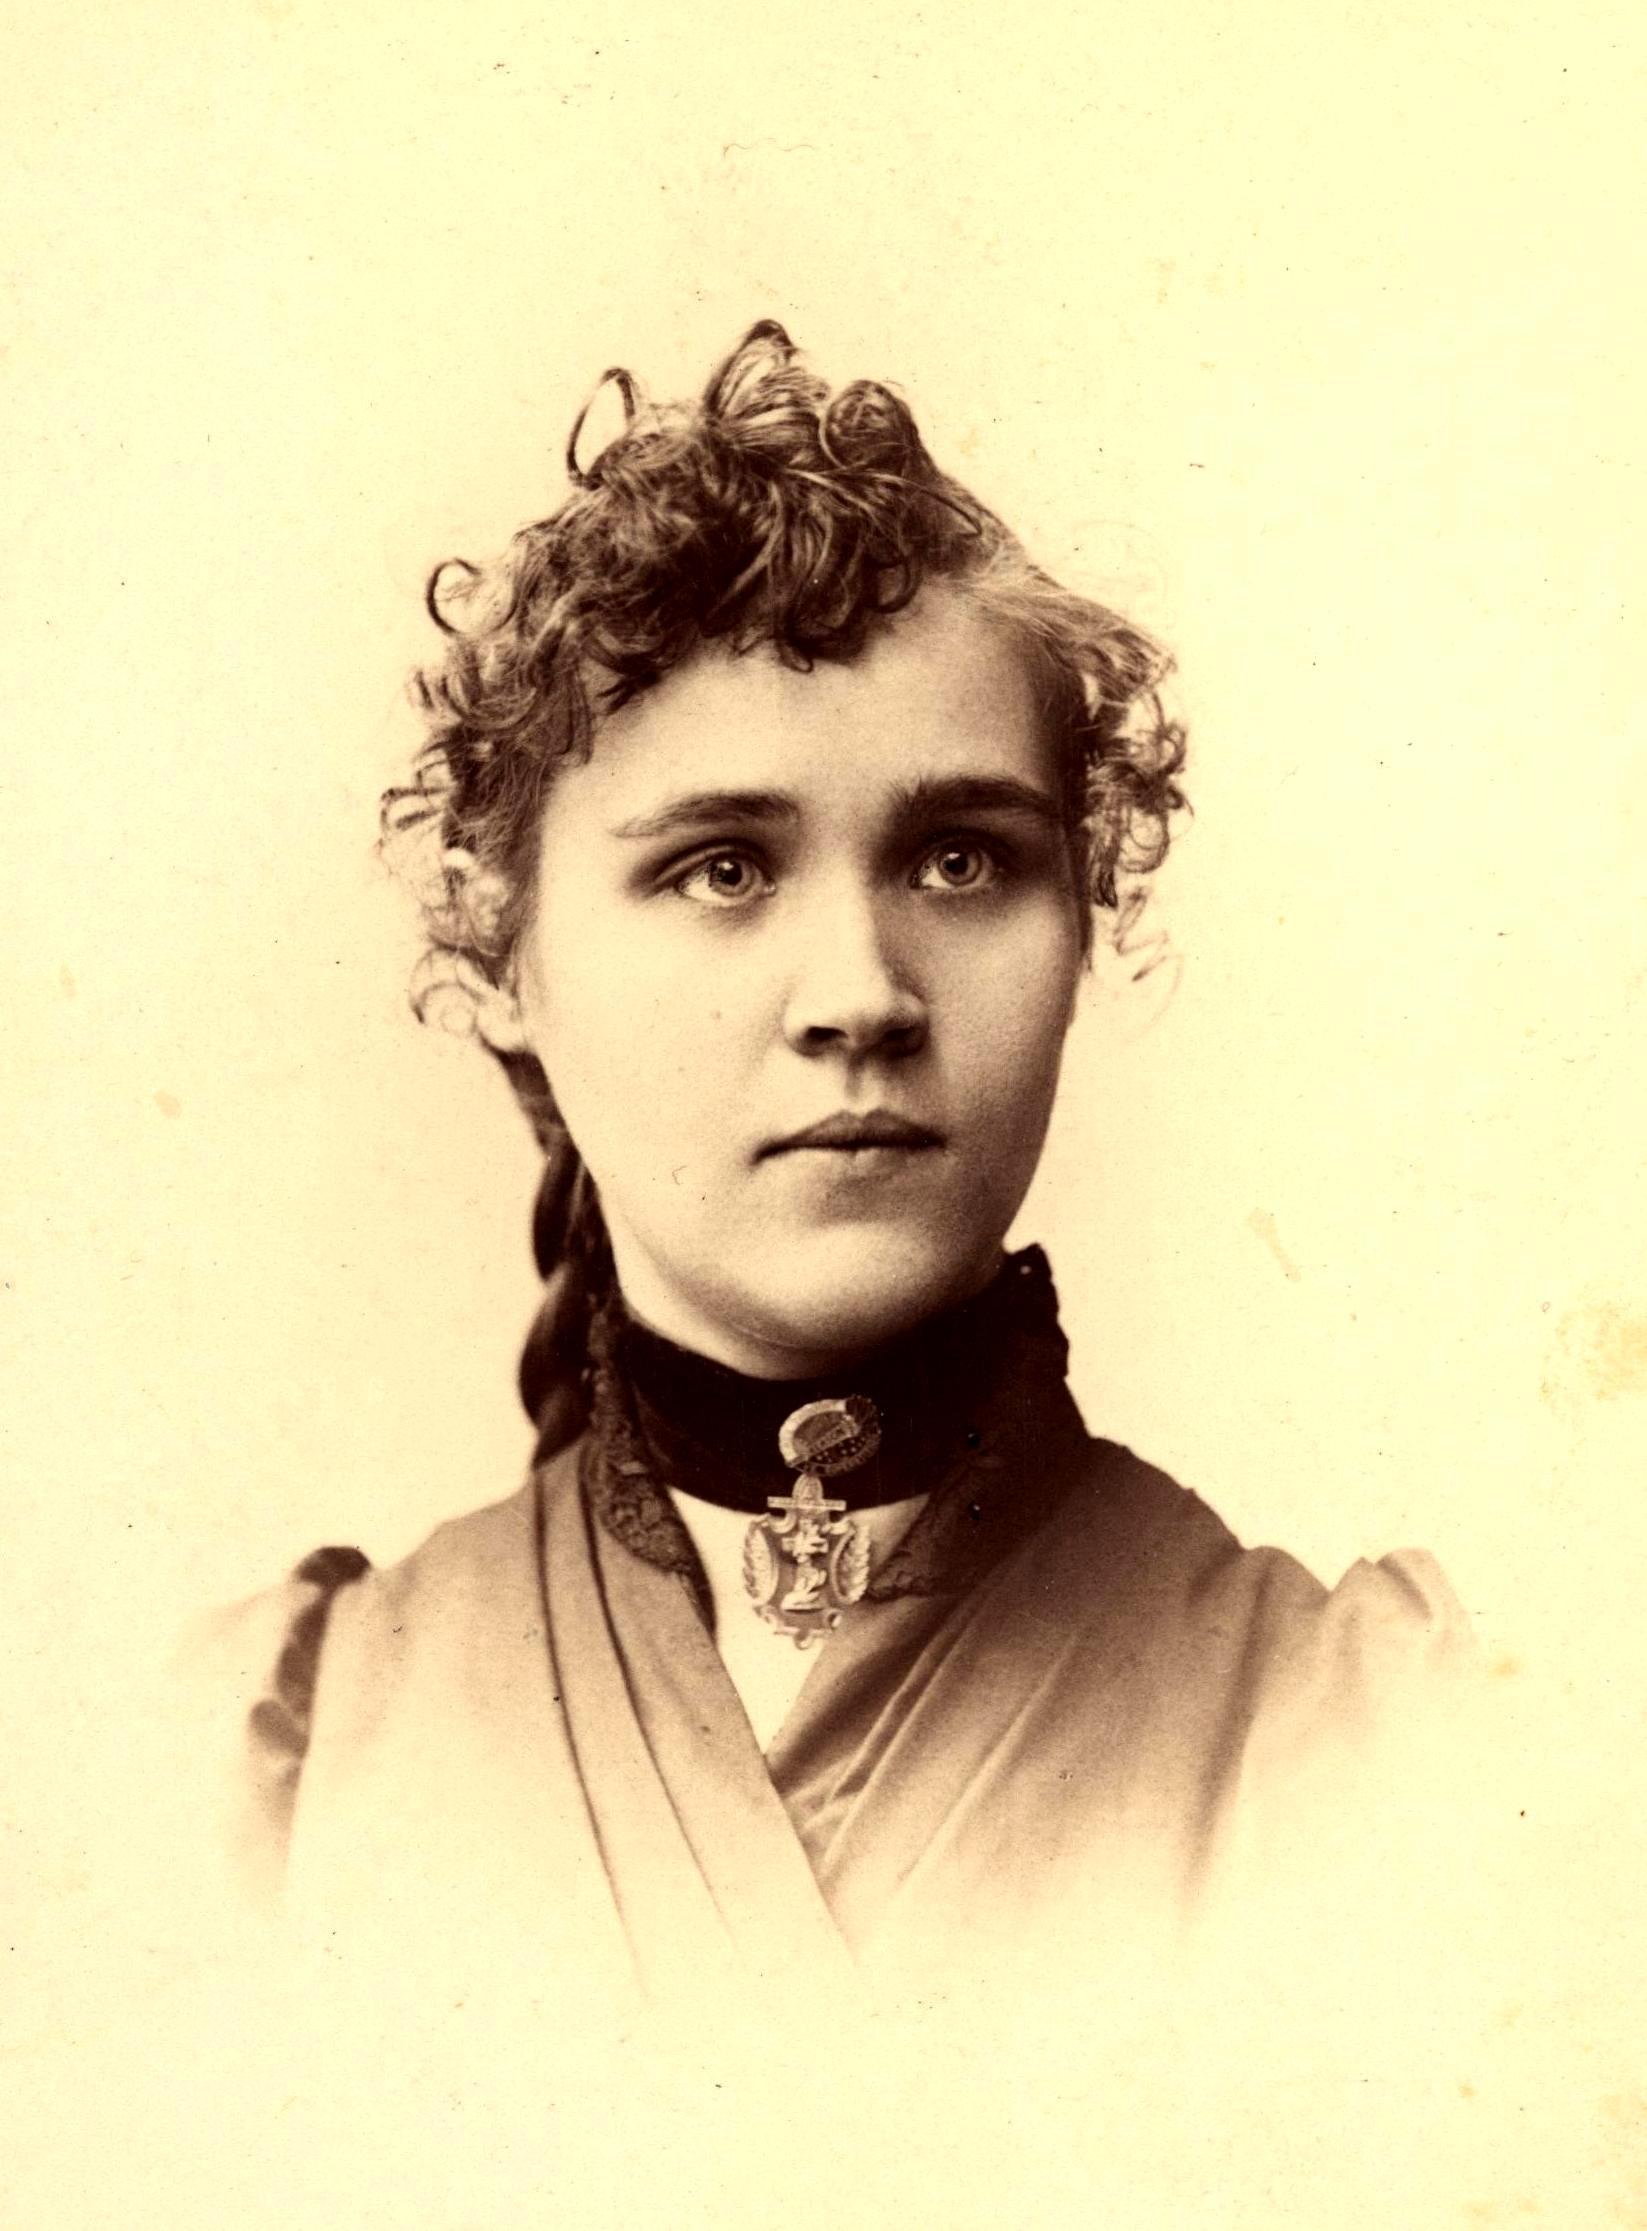 Voltairine de Cleyre fotografiada per Kuebler (Filadèlfia, 1891)